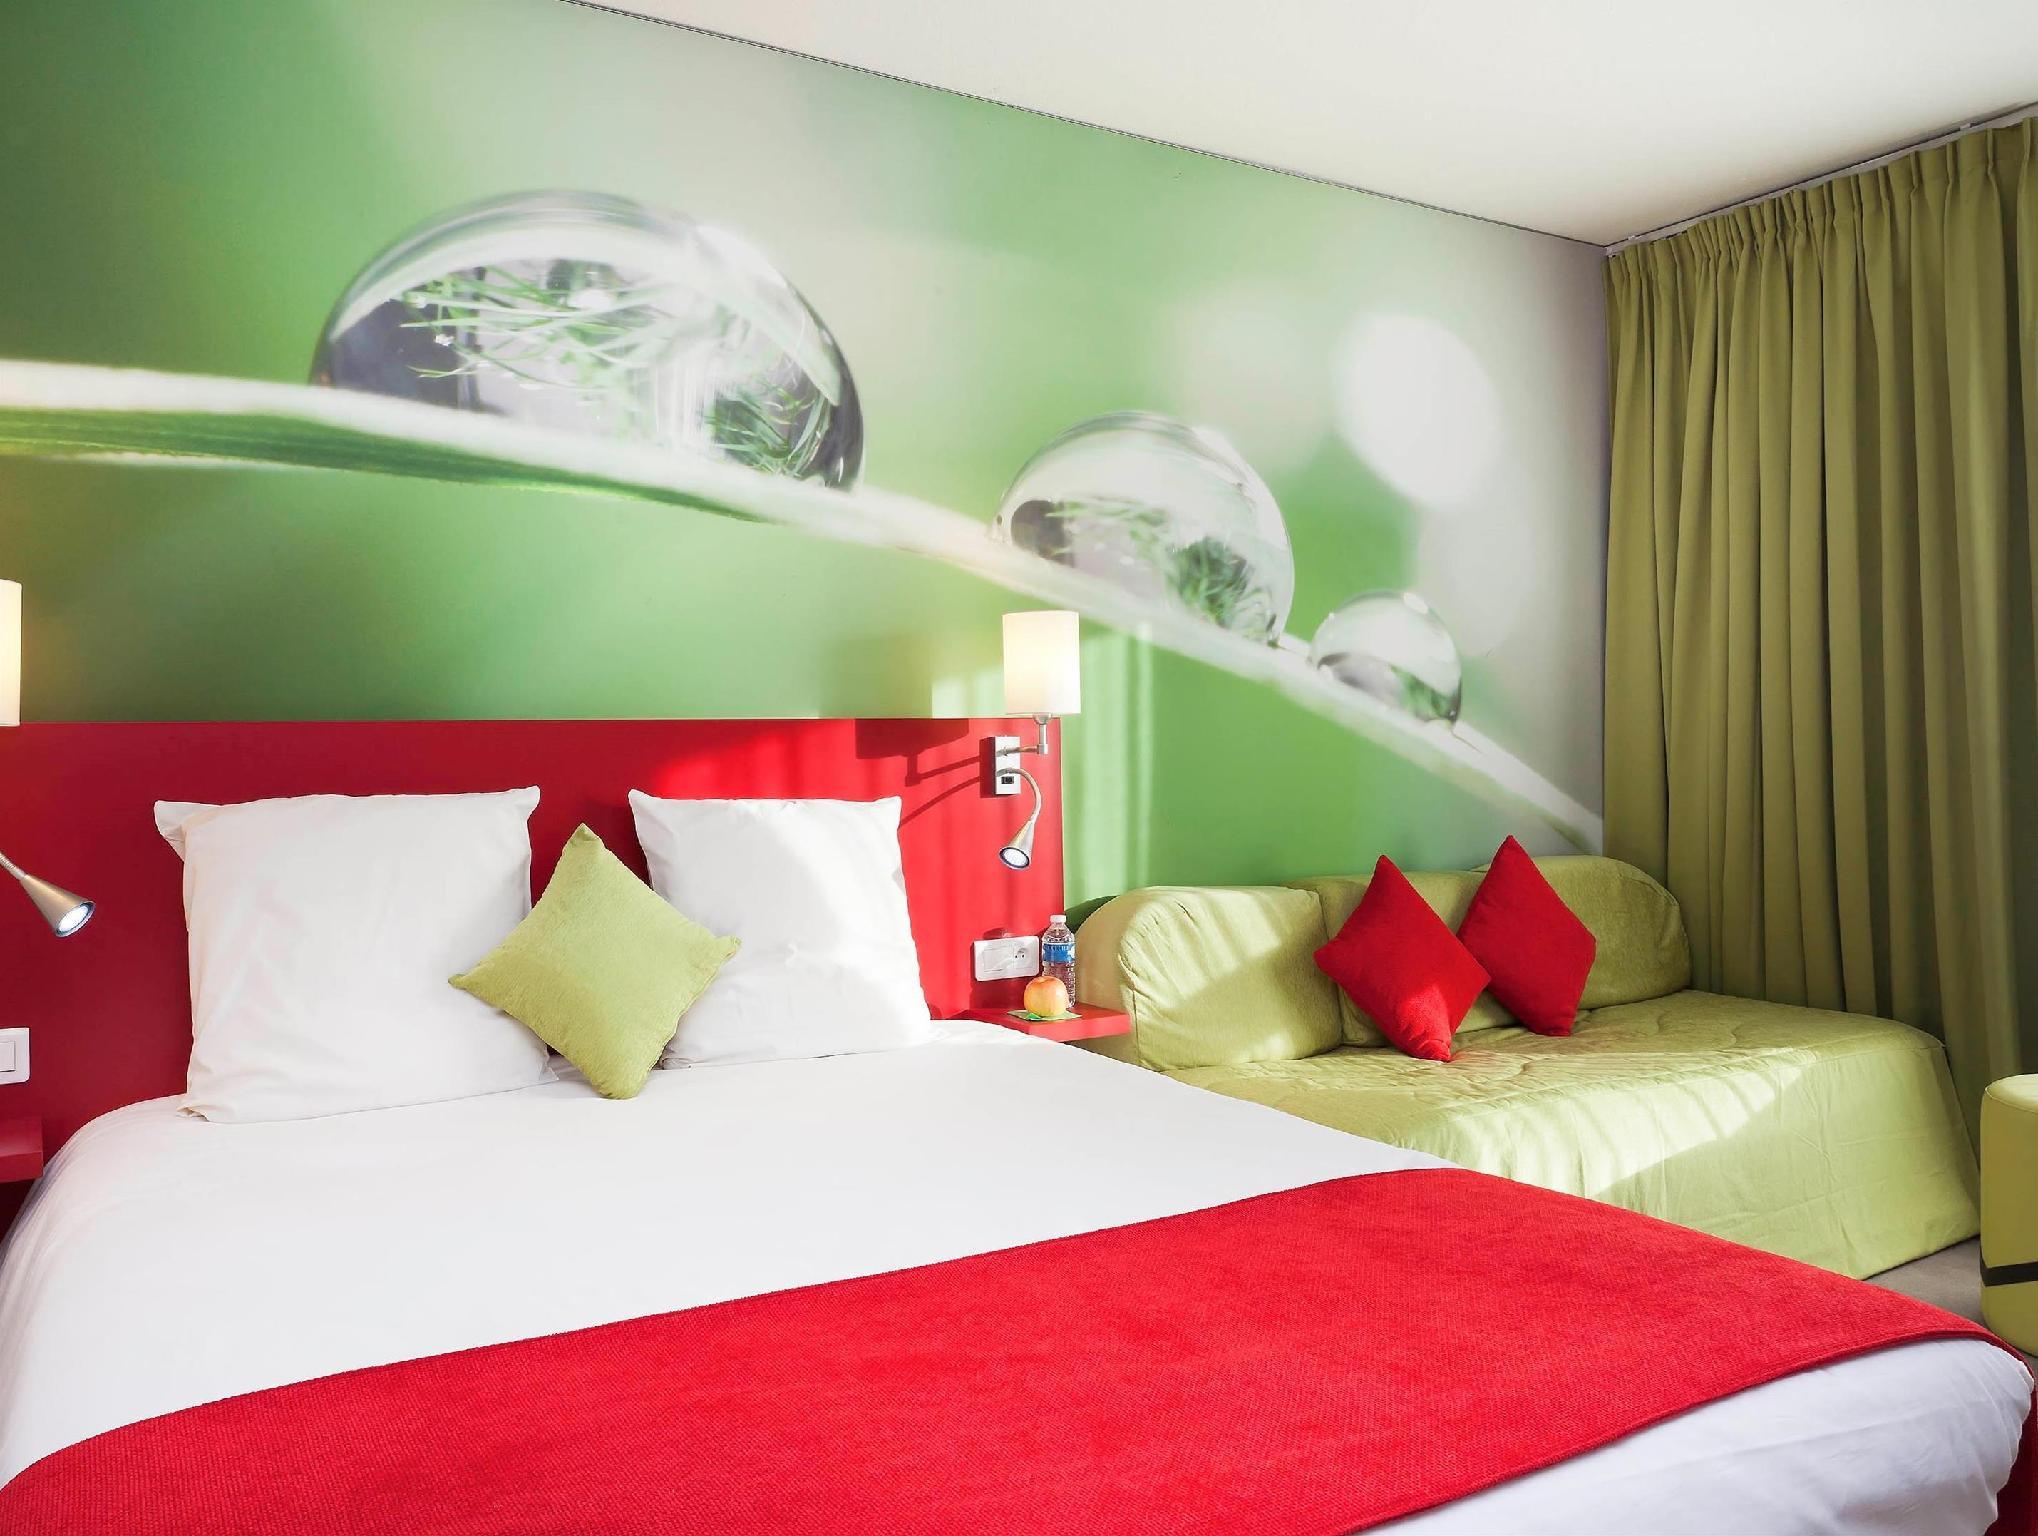 Ibis Styles Avignon Sud Hotel